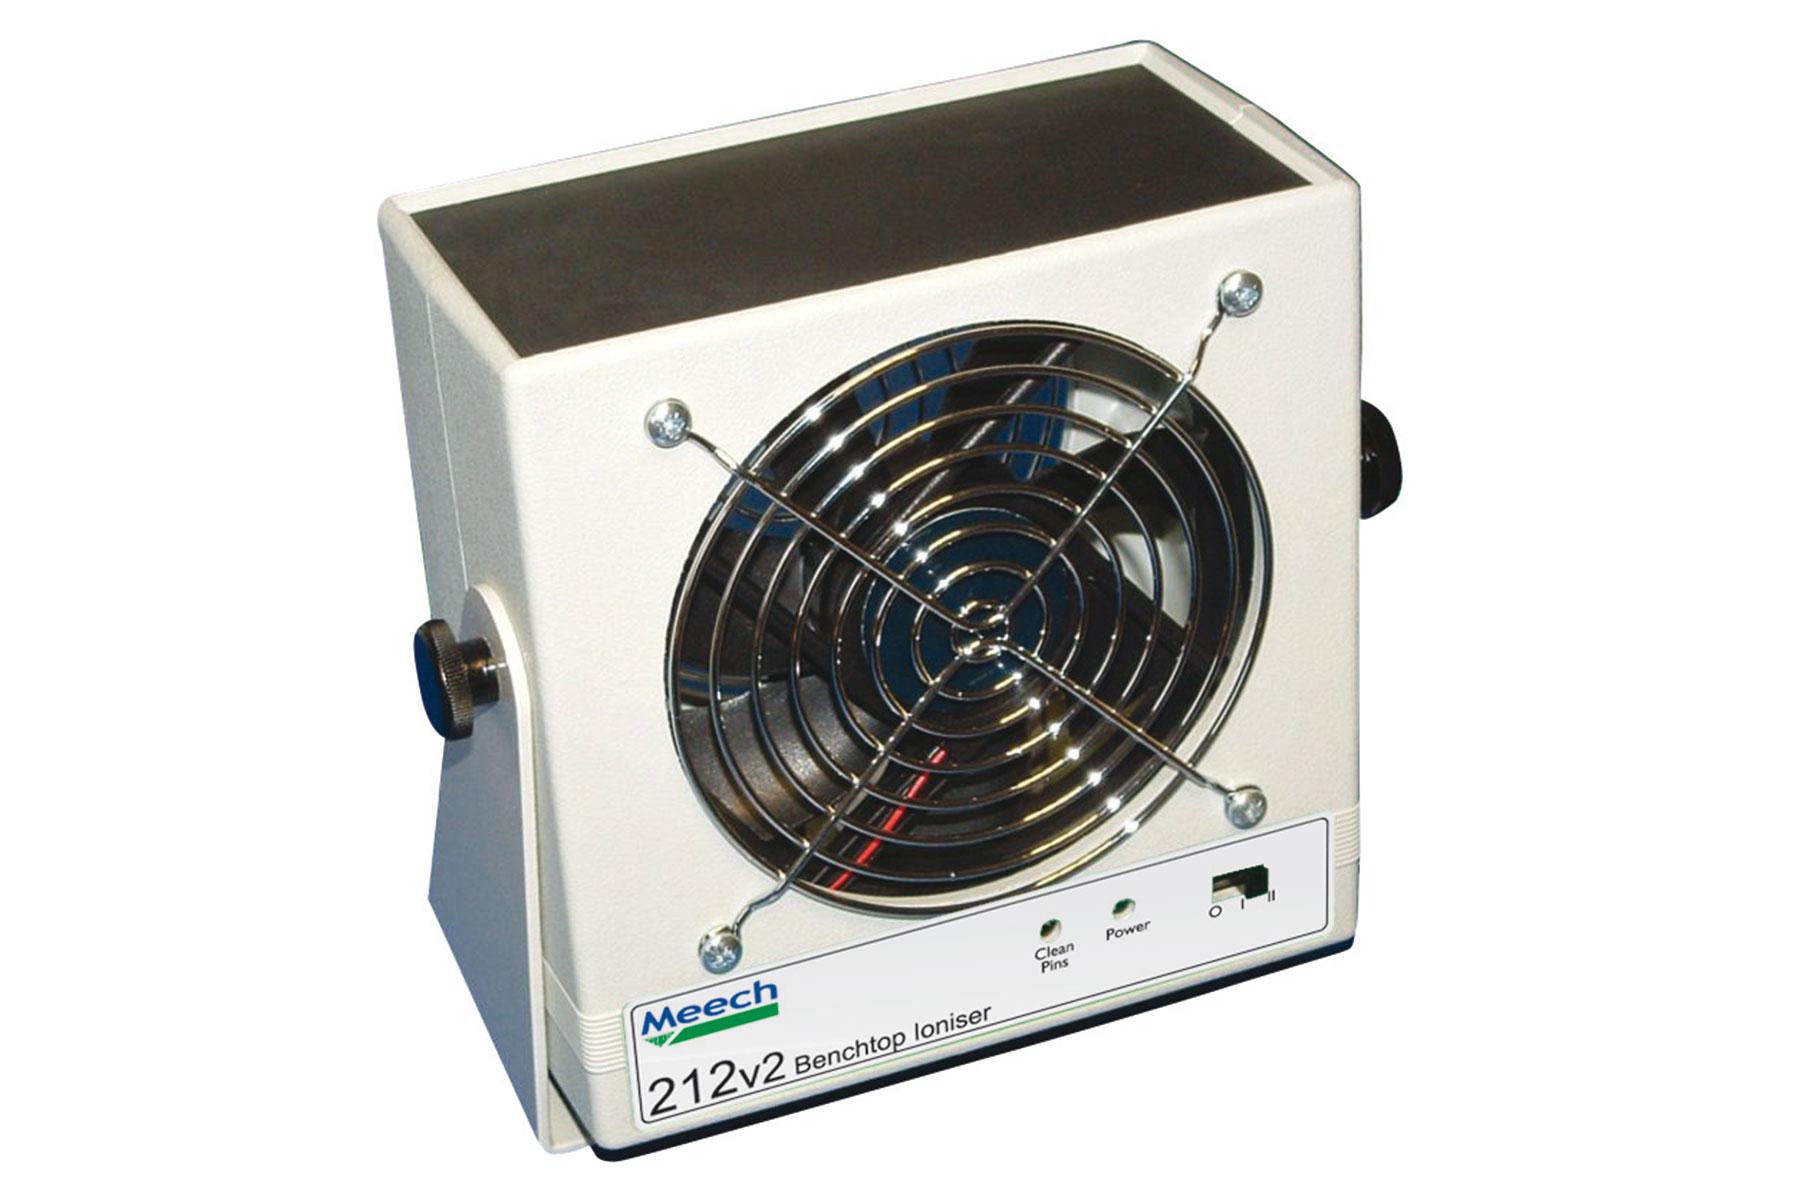 212v2 Munkaasztal ionizátor